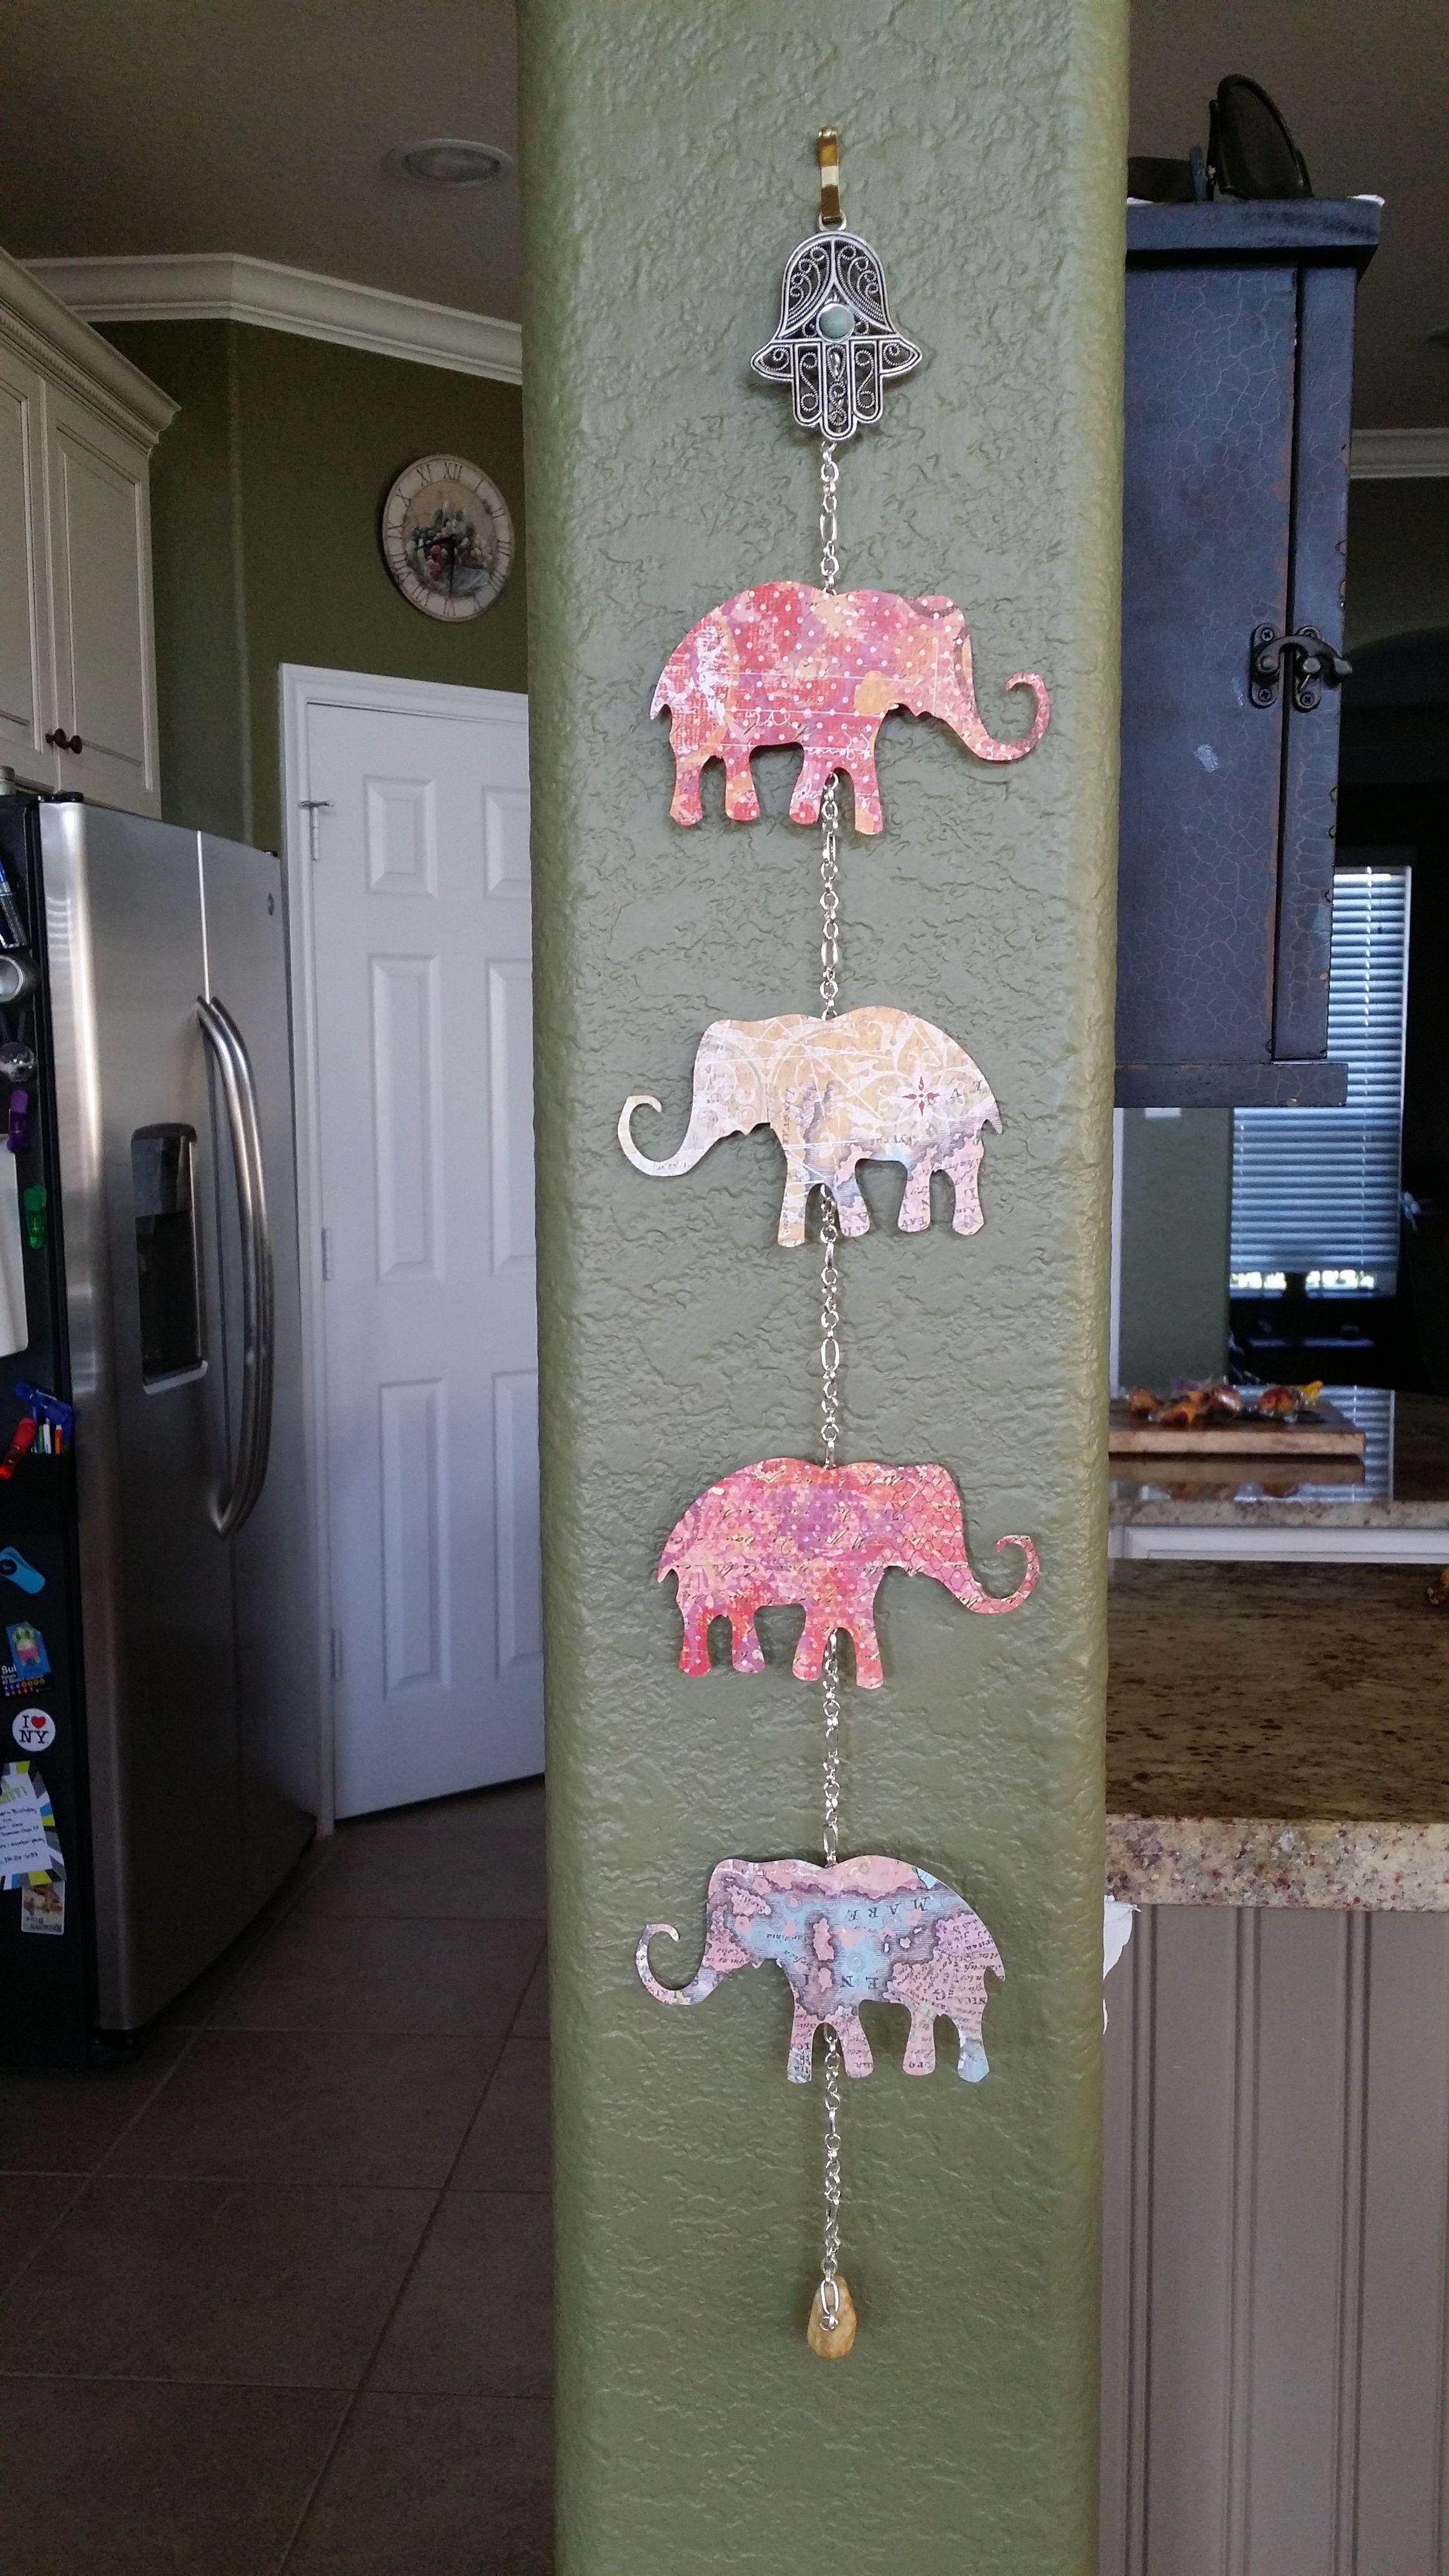 dorm / teen room decor ideas: hanging elephants with silver hamsa